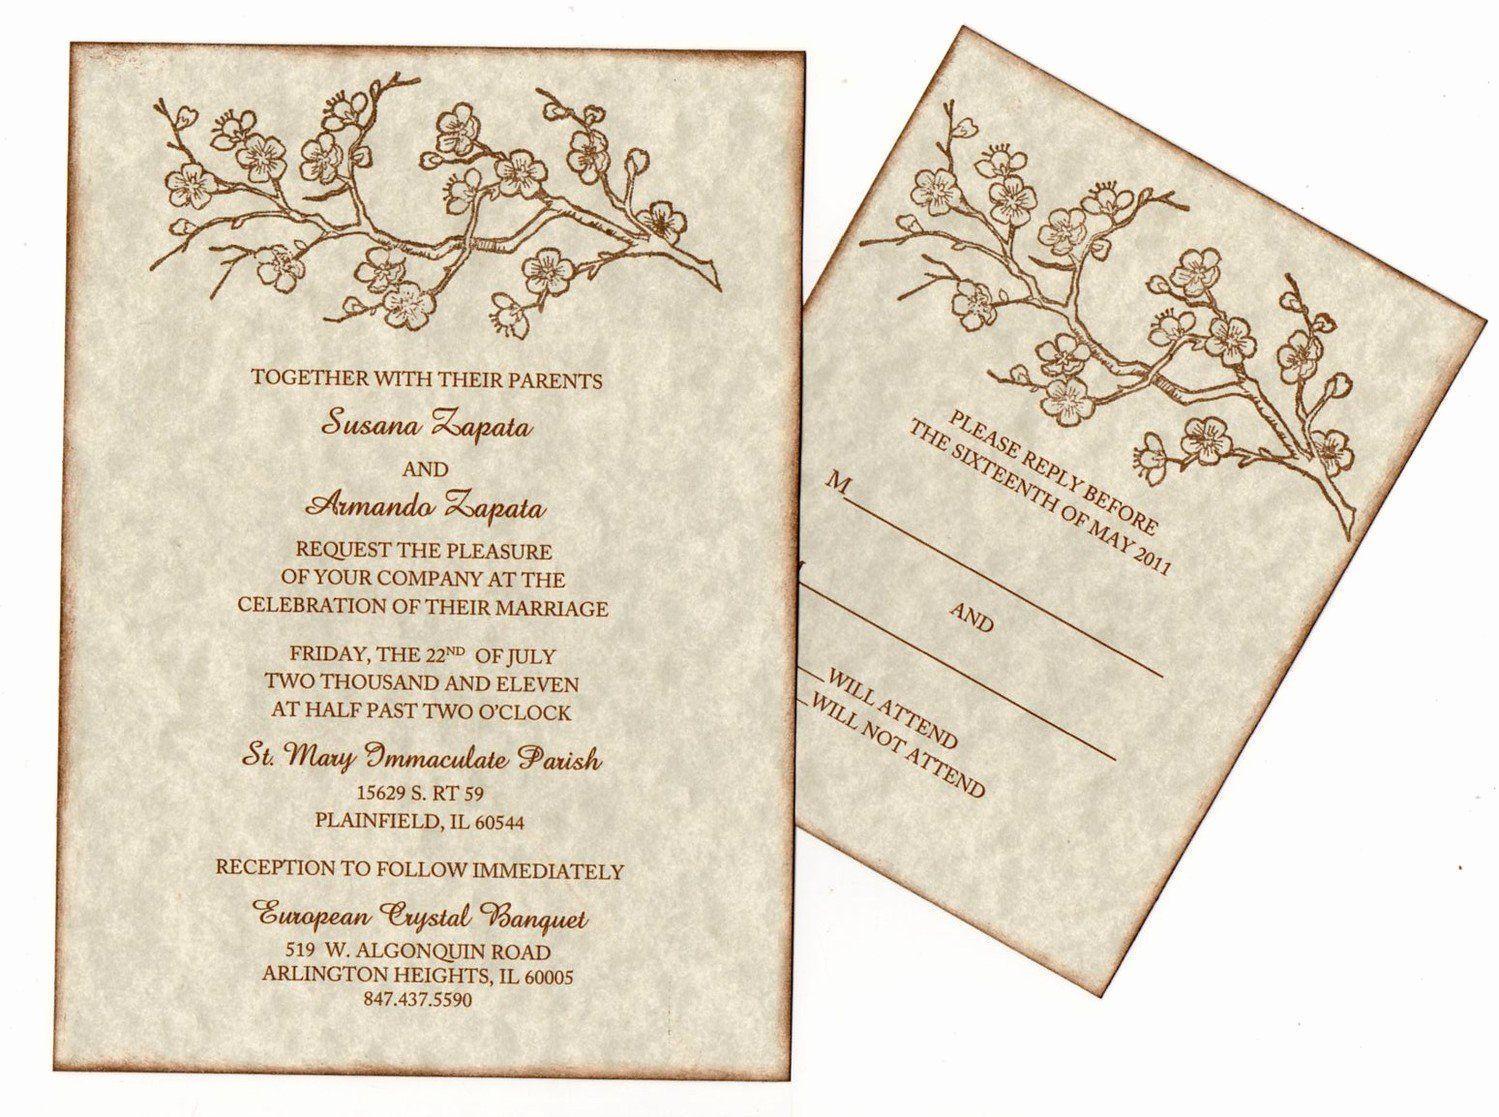 Indian Wedding Card Template Fresh South Indian Wedding In Indian Wedding Invitation Card Design Indian Wedding Invitation Cards Wedding Invitation Card Design